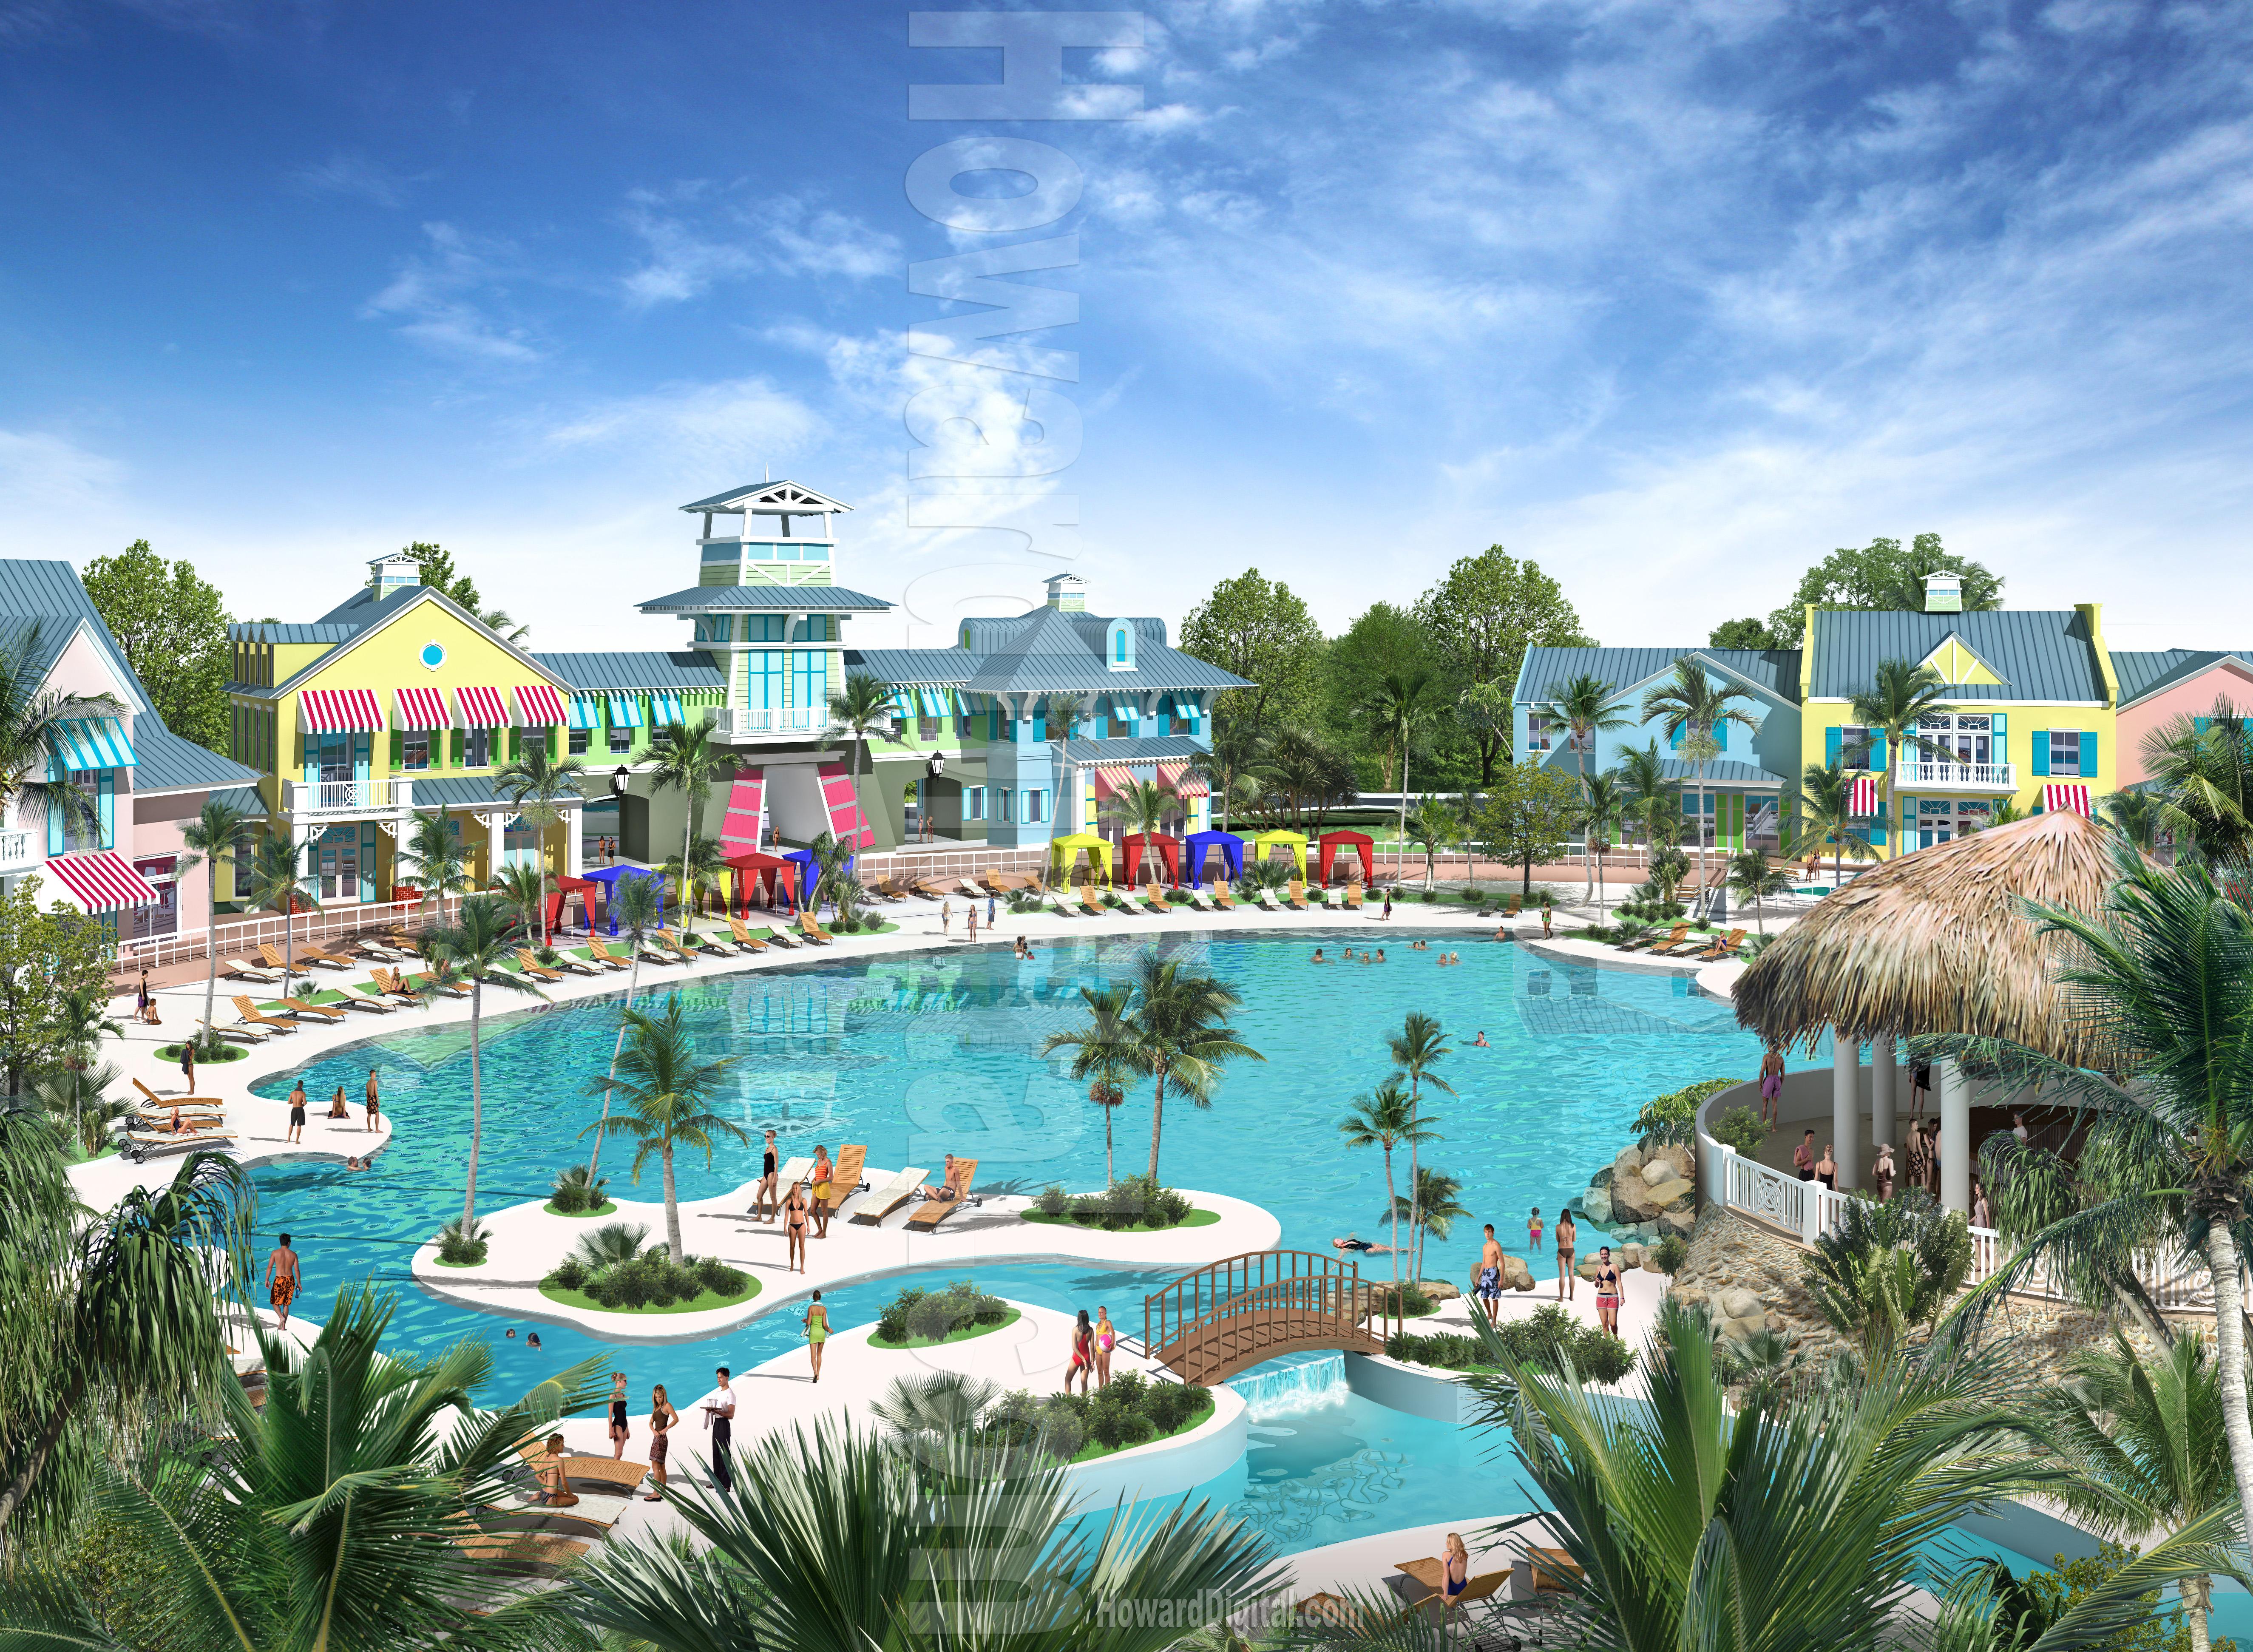 Architectural Renderings San Rio Resort Shallotte